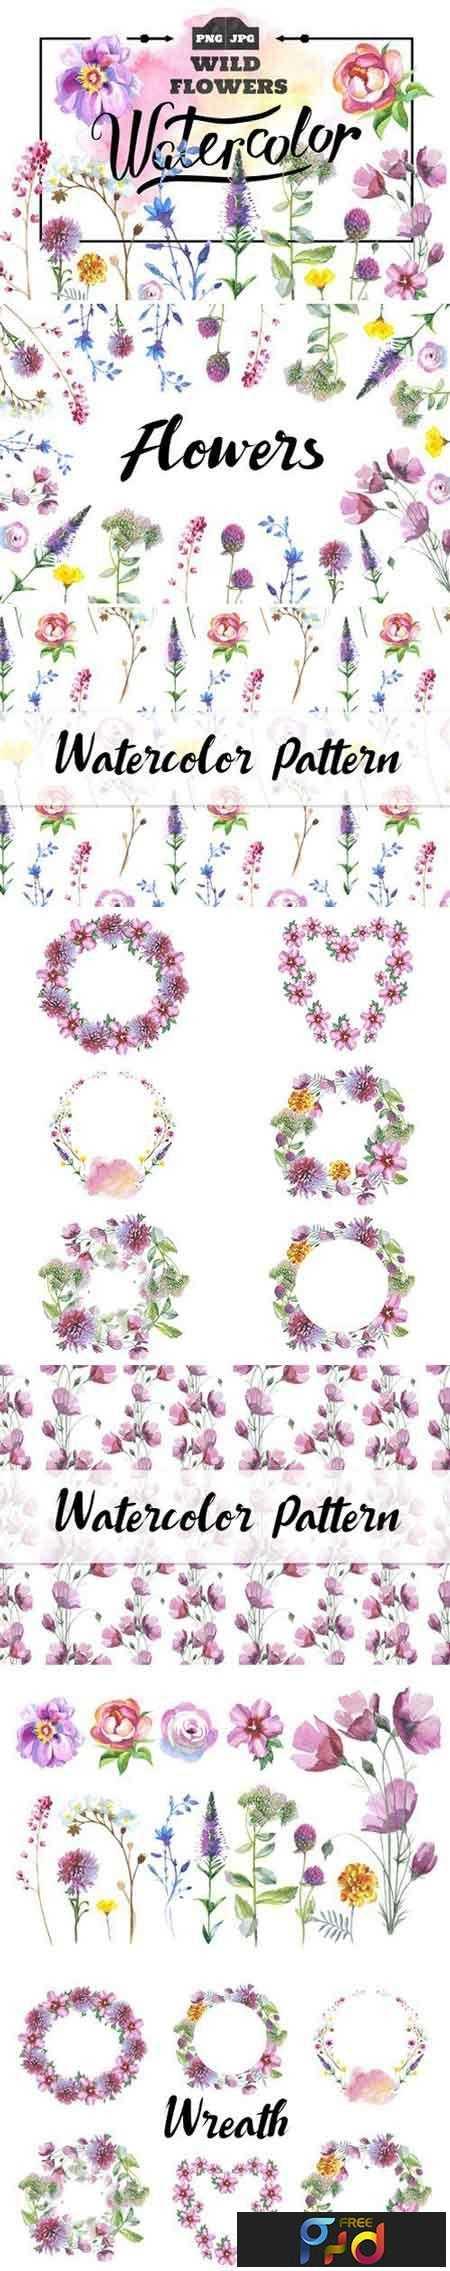 1811299 Wild Flowers watercolor PNG set 932555 1